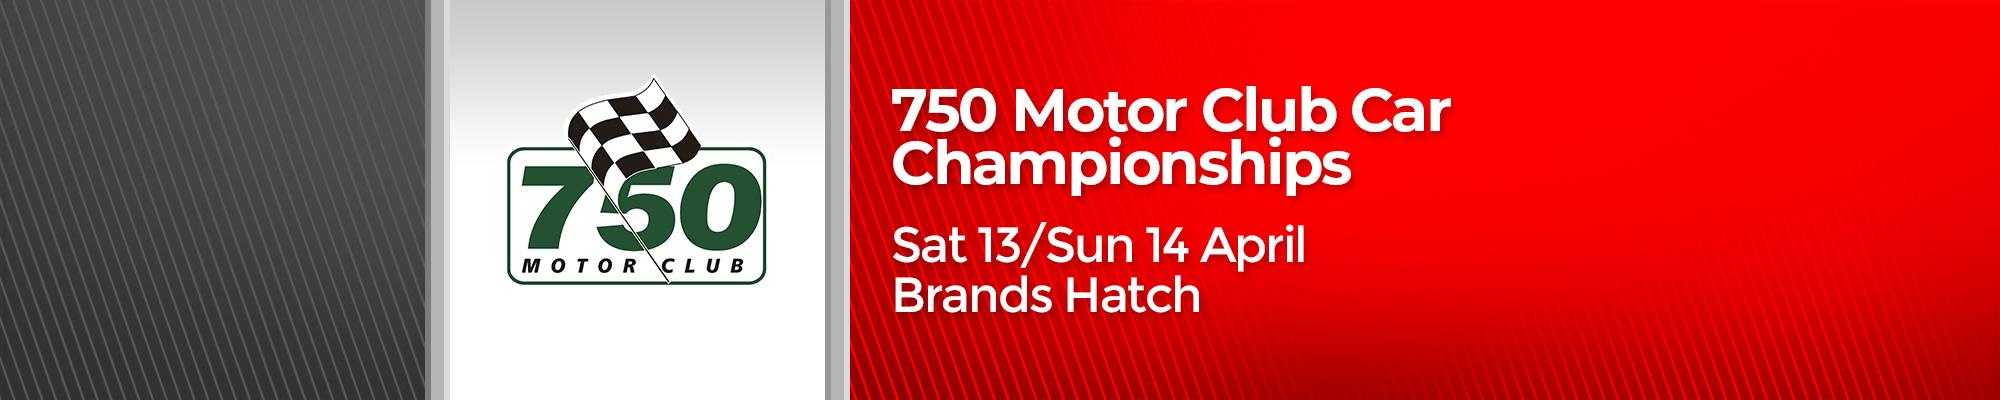 750 Motor Club Car Championships